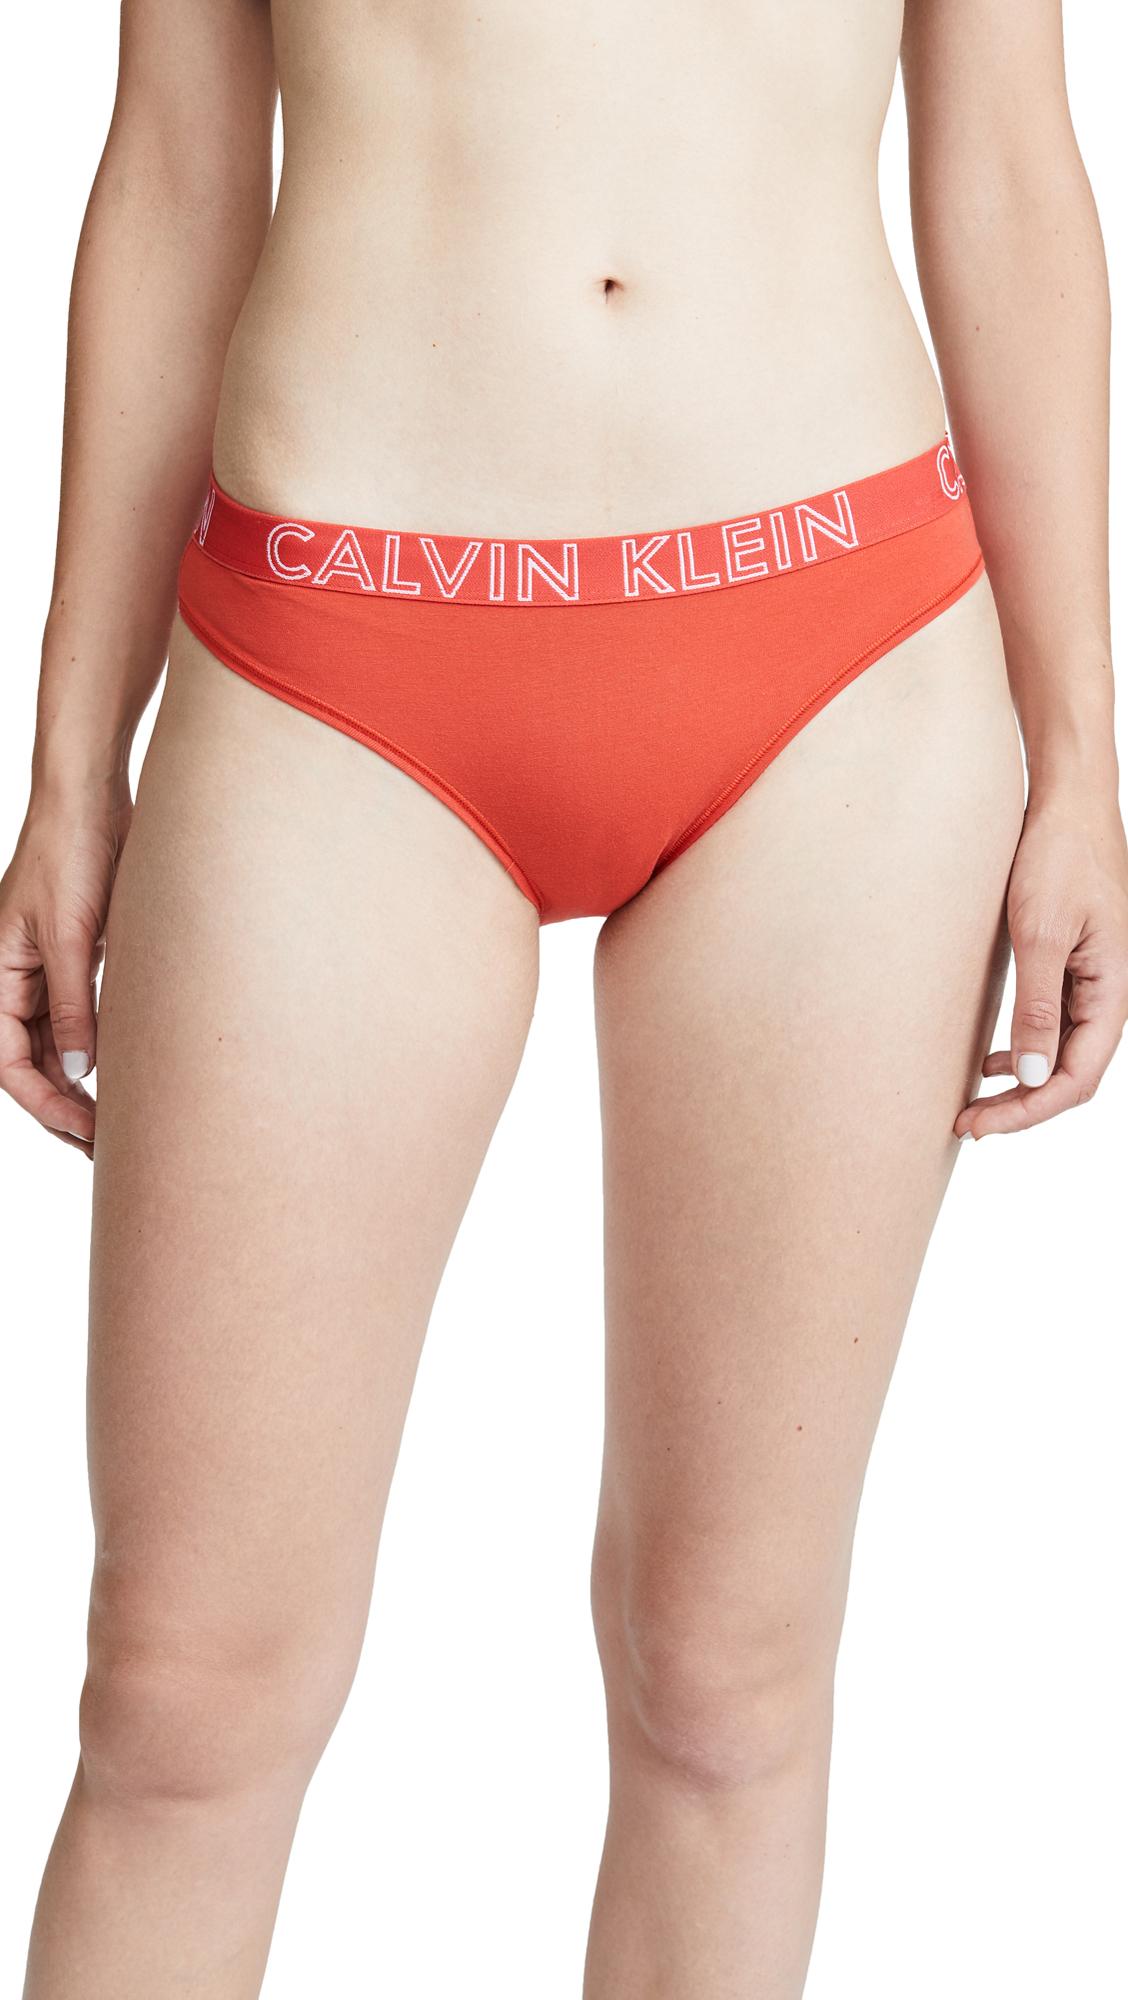 Calvin Klein Underwear Ultimate Cotton Bikini In Marlow